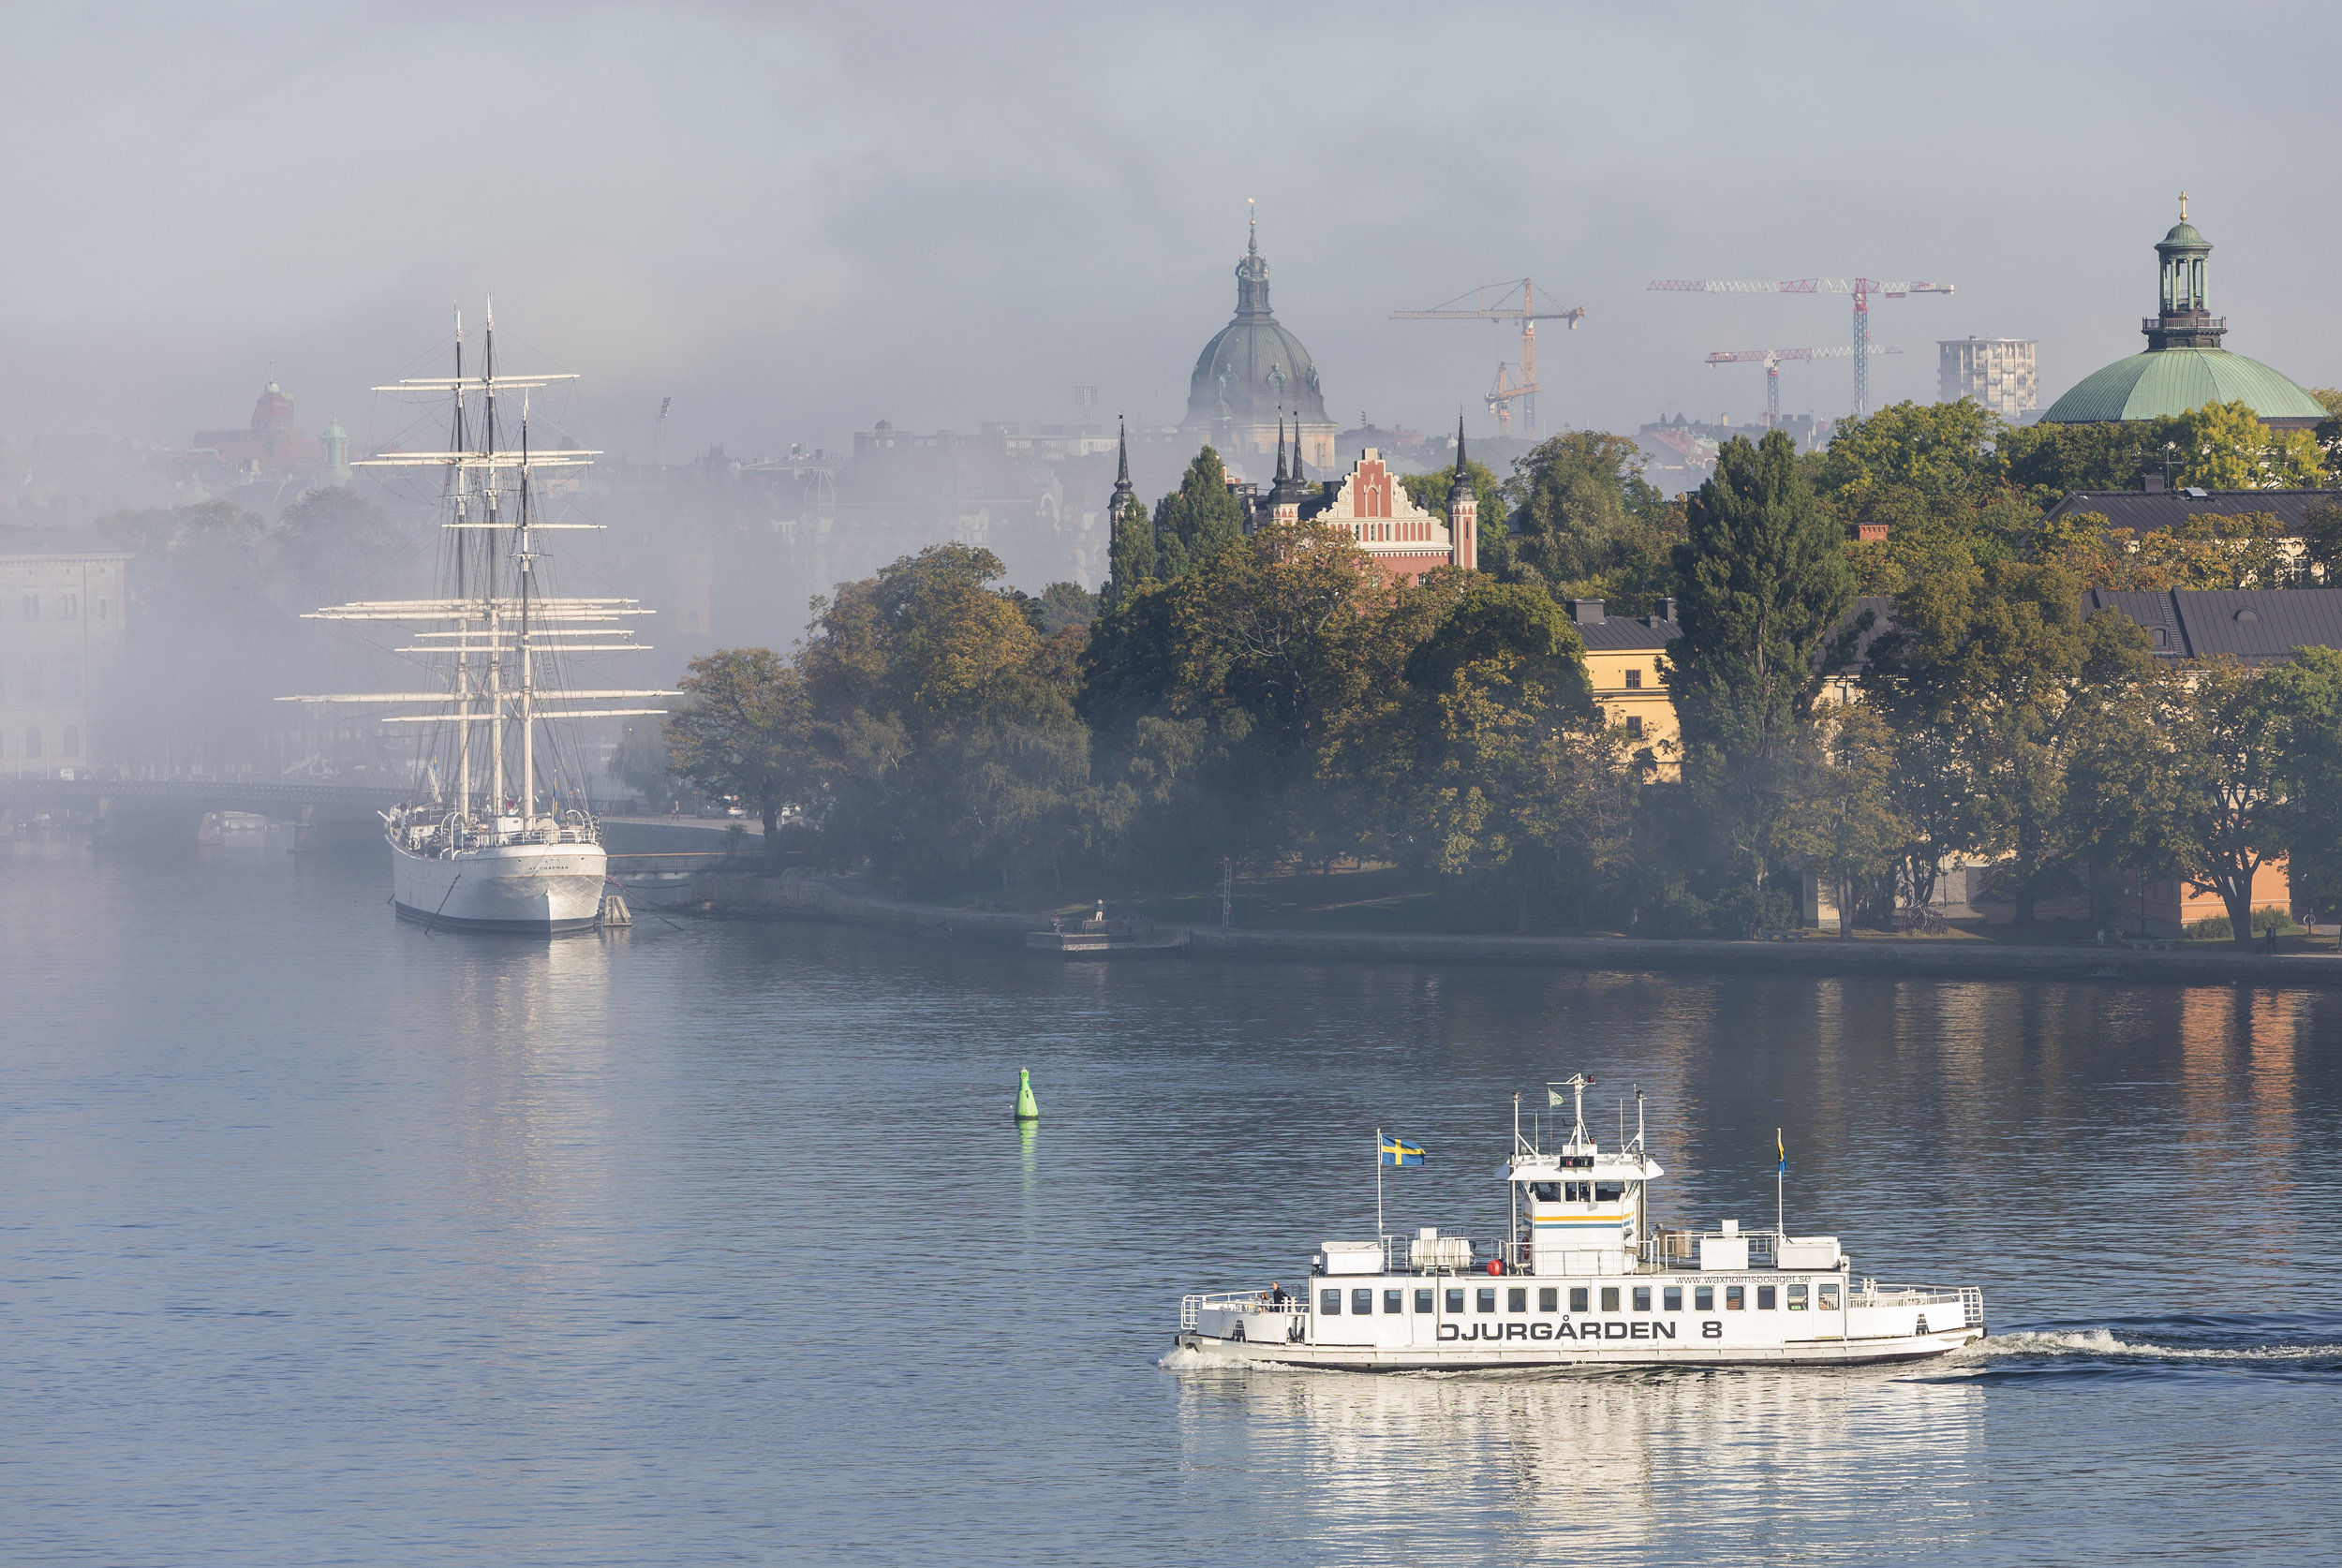 The Djurgården line. Photo credit: Henrik Trygg